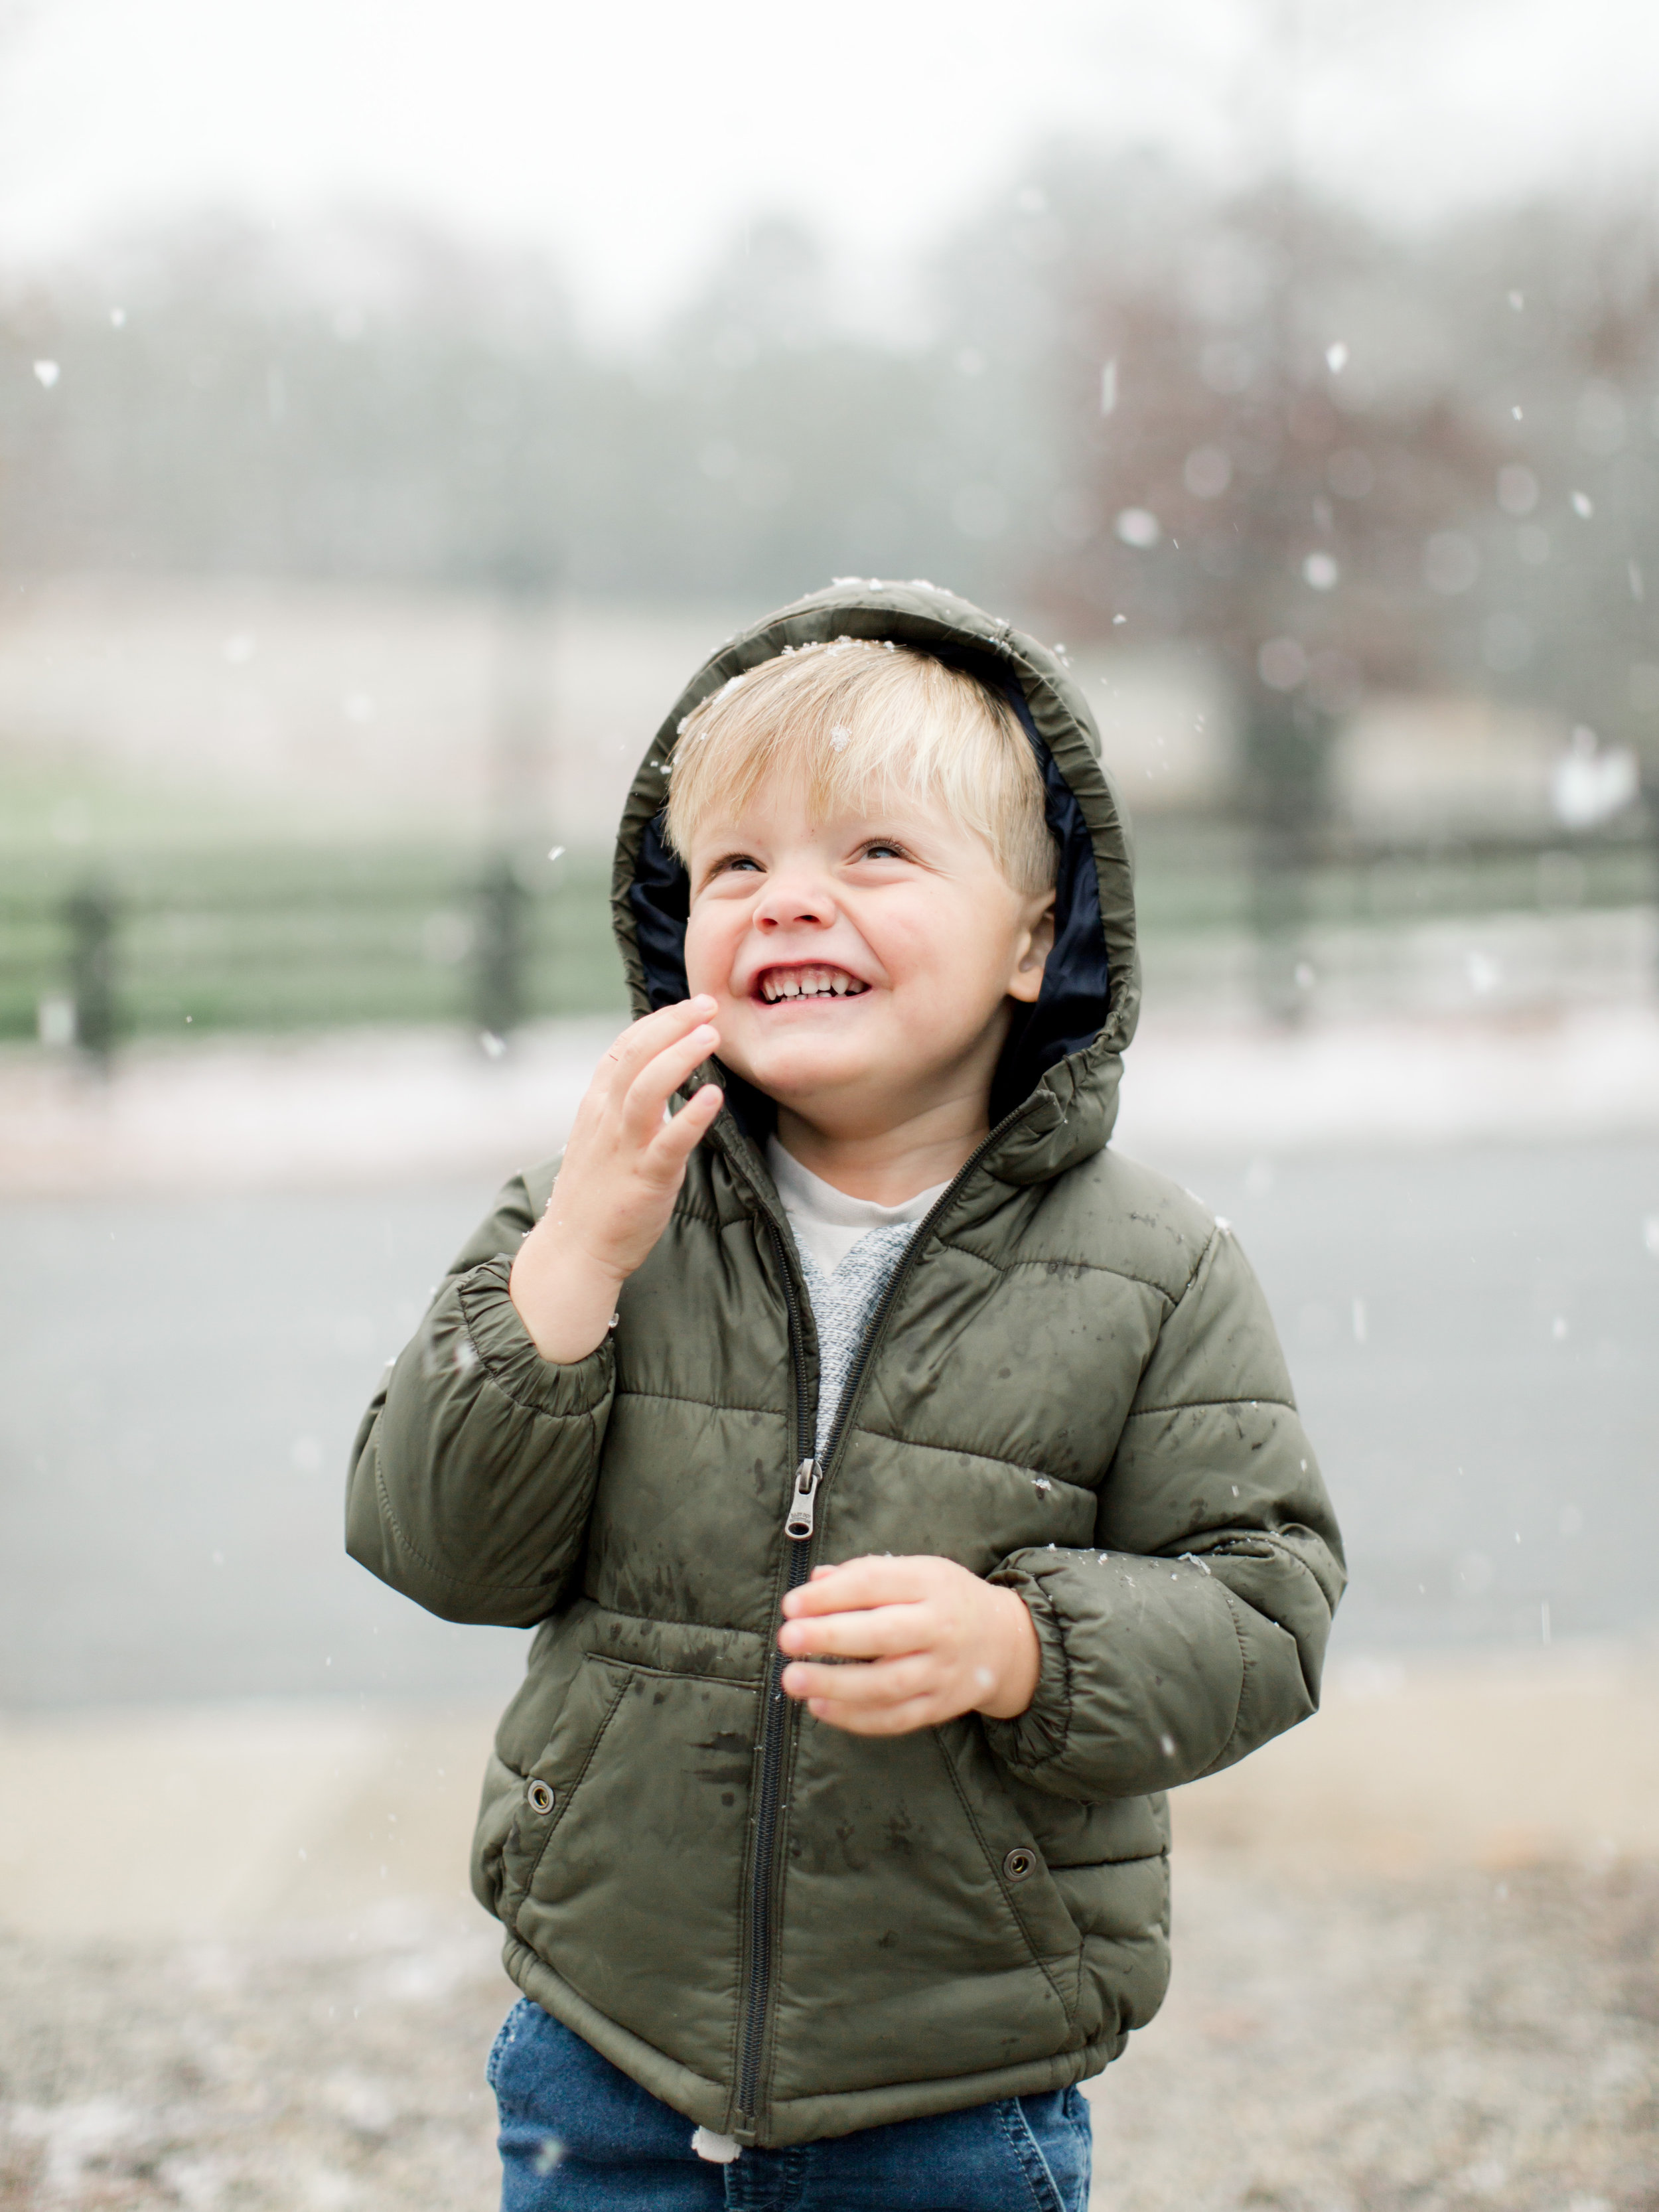 ahp_firstsnow_snowball_fight_DW7A6831.jpg